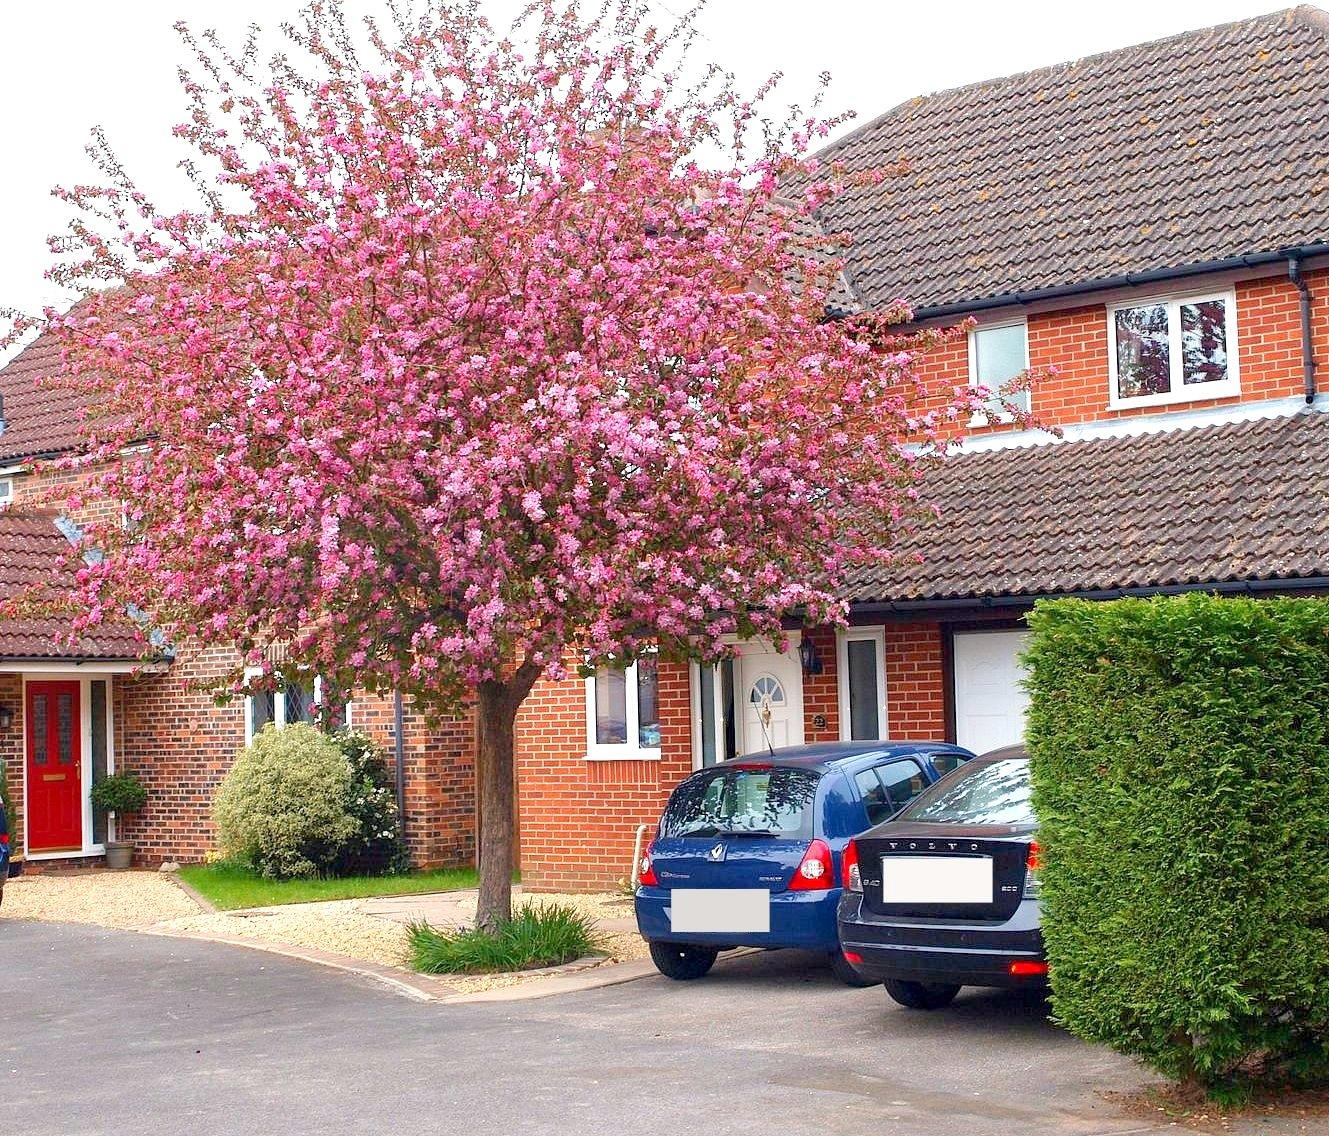 Цветущее дерево перед домом